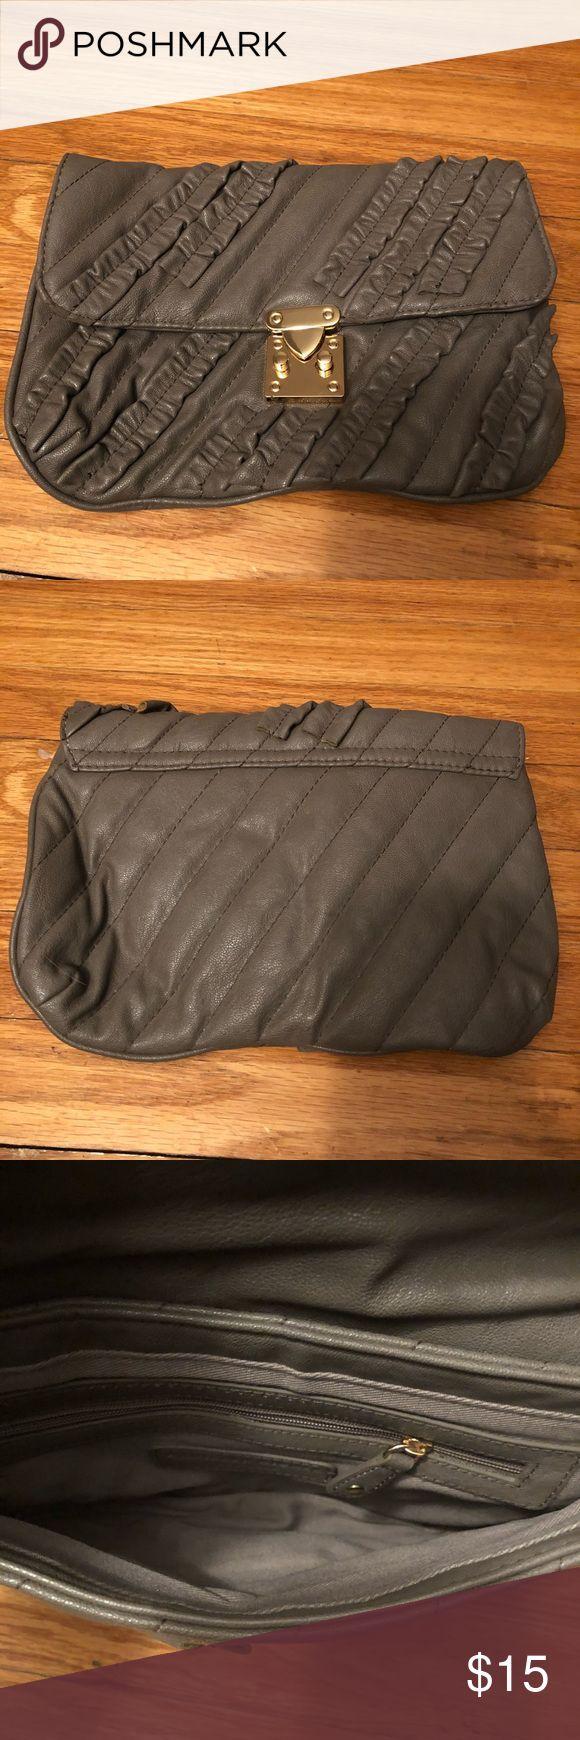 Grey ruffled clutch Grey clutch bag. Worn once. Bags Clutches & Wristlets